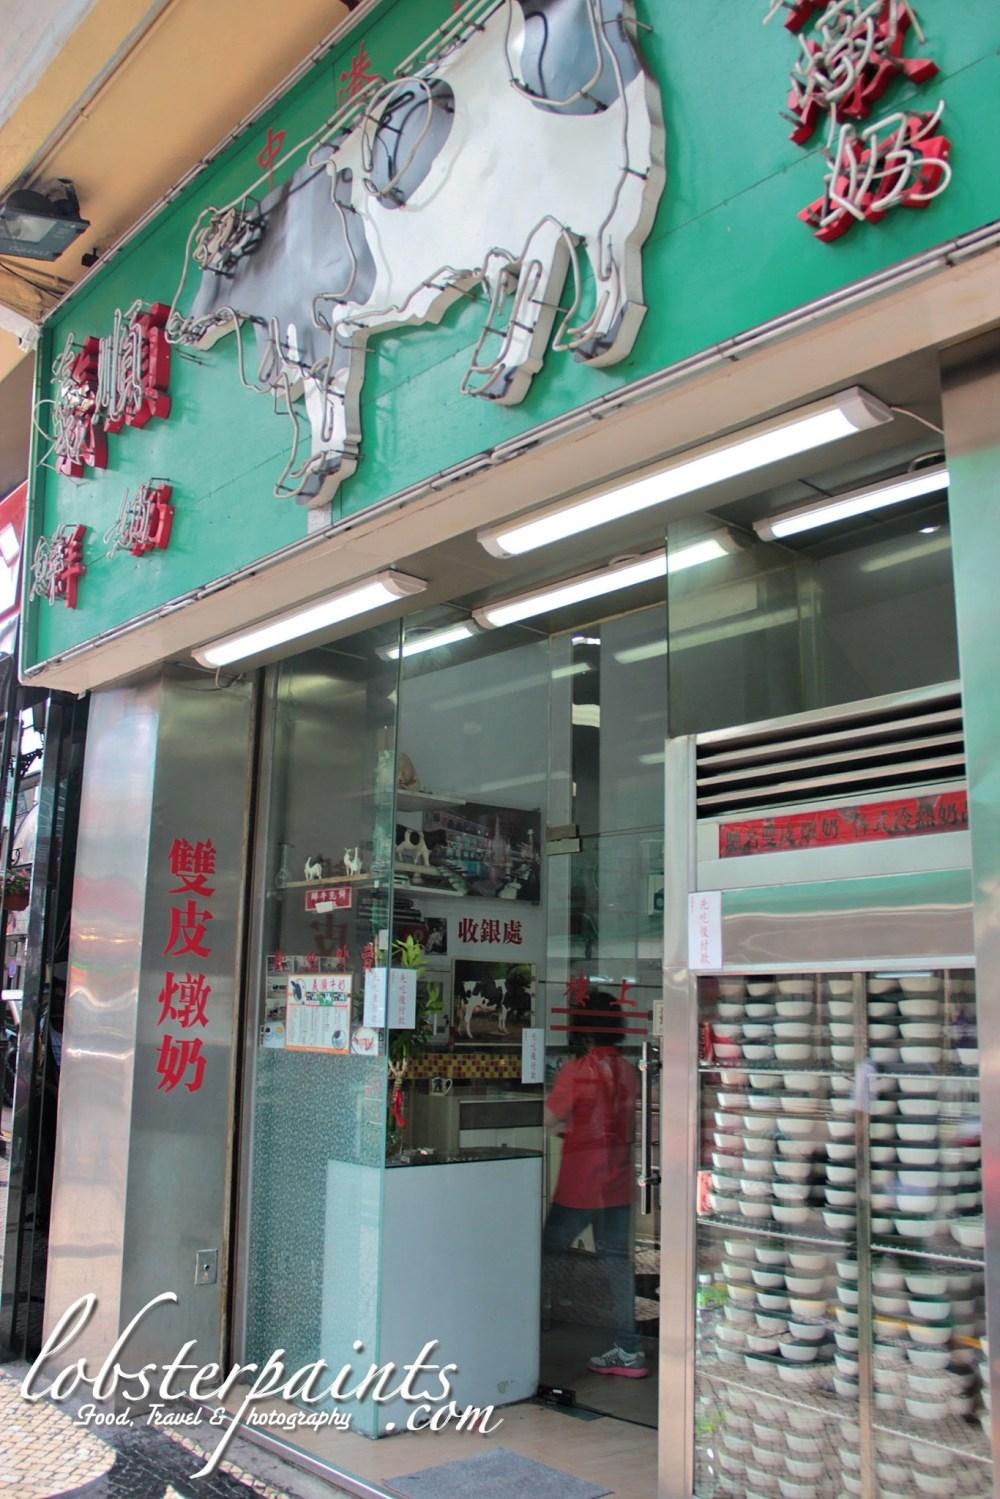 Yee Shun Milk Company 義順牛奶公司 | Macau, China